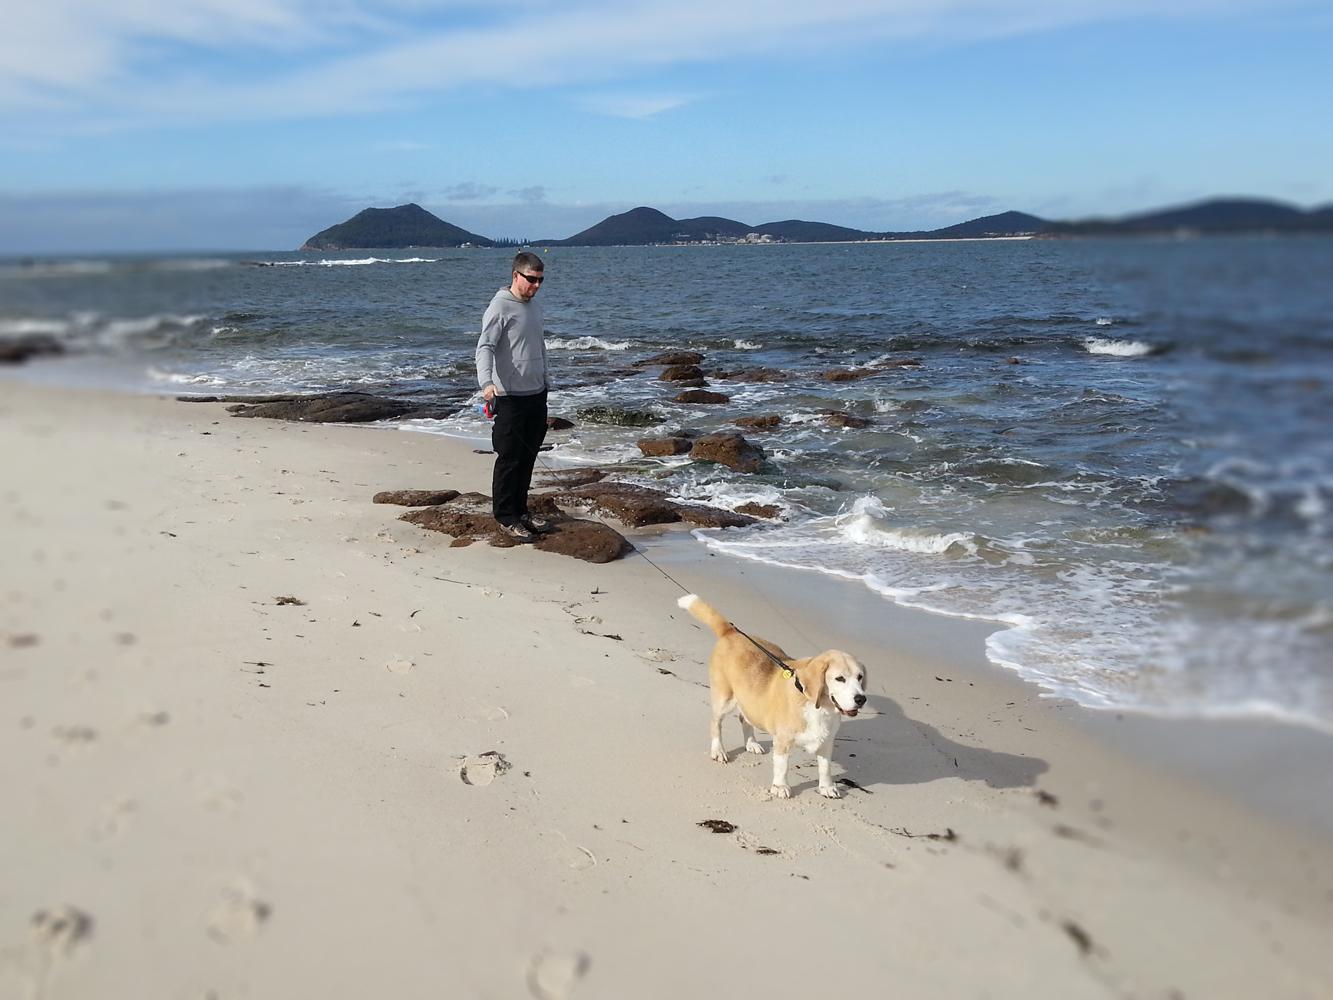 aidan-brinkley-at-the-beach